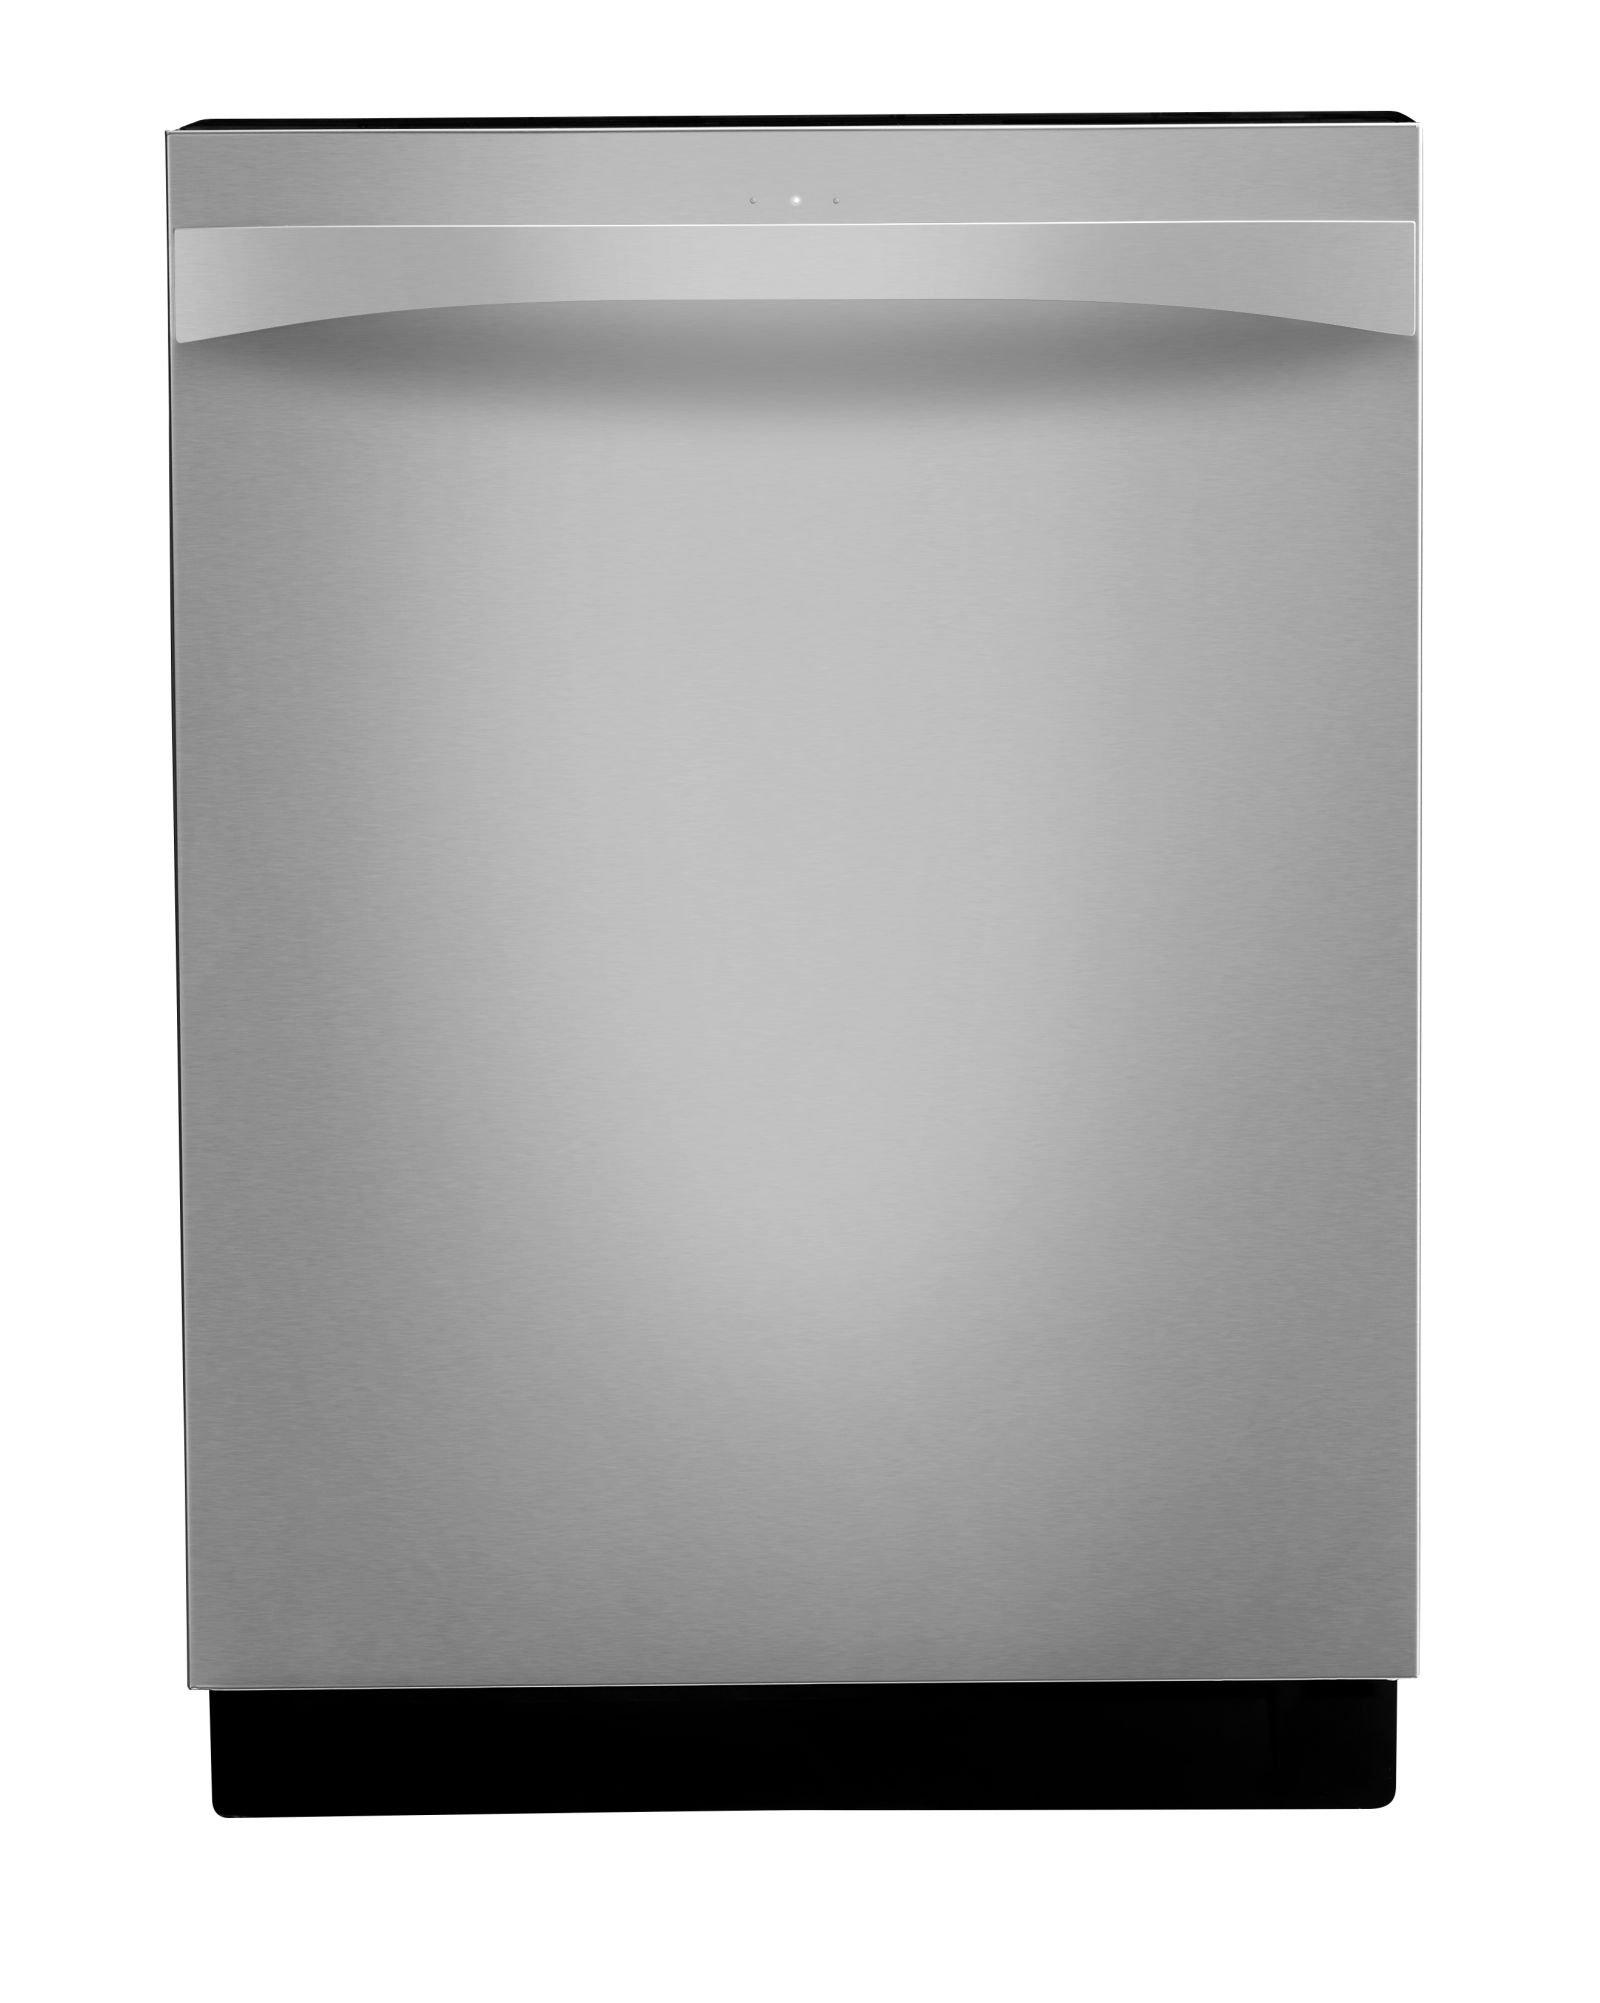 Kenmore 14673 SMART Dishwasher with 360° PowerWash, Stainless Steel